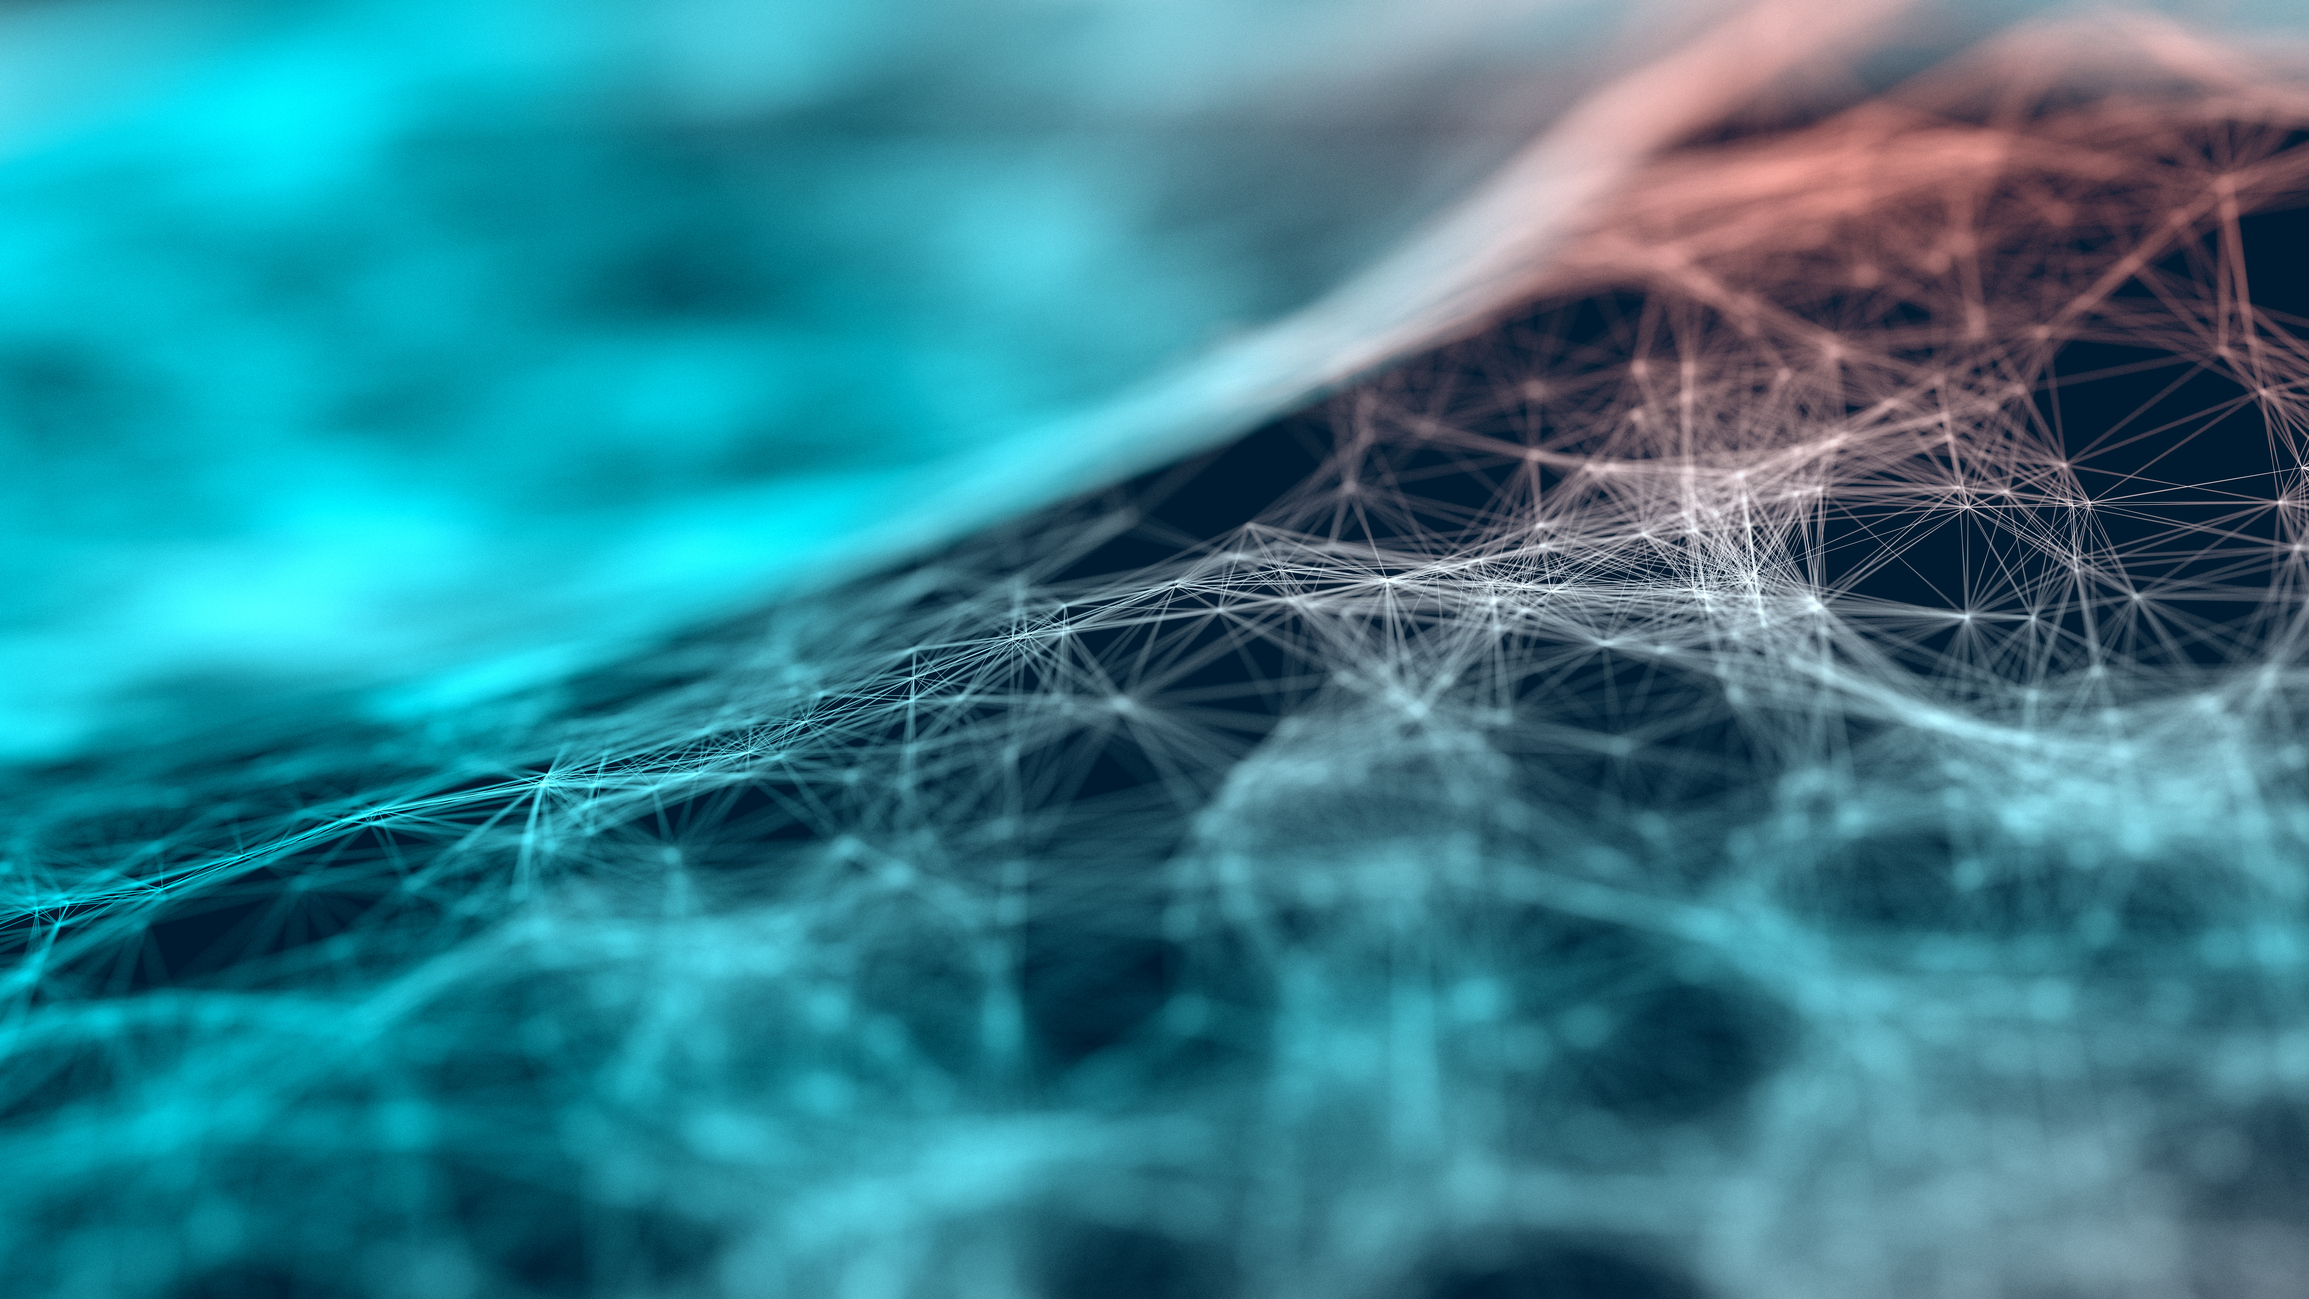 techcrunch.com - Frederic Lardinois - ETH spin-off LatticeFlow raises $2.8M to help build trustworthy AI systems